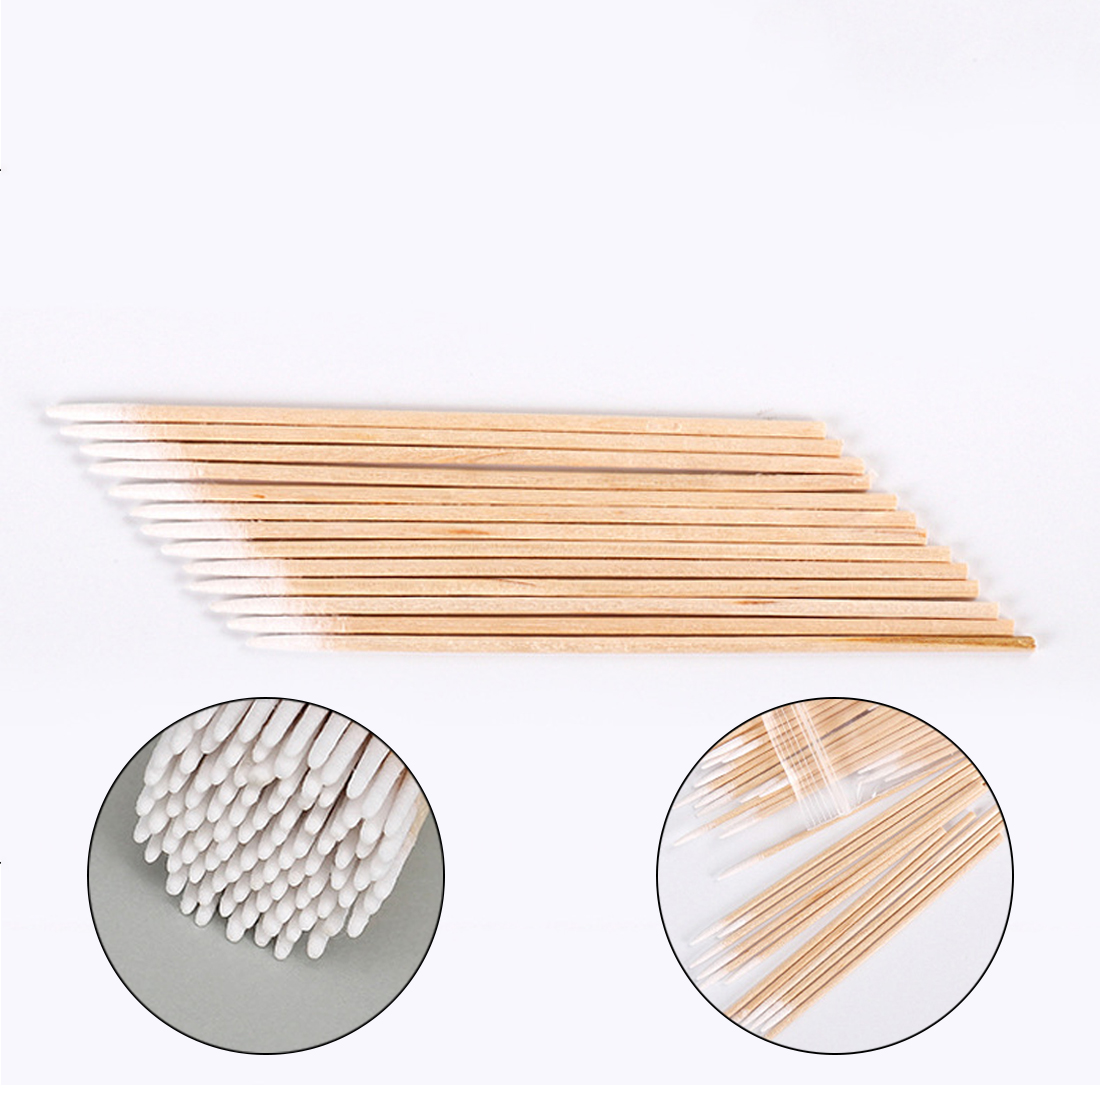 Top 100pcs 7cm Wood Cotton Swab Cosmetics Permanent Makeup Health Medical Ear Jewelry Clean Sticks Buds Tip